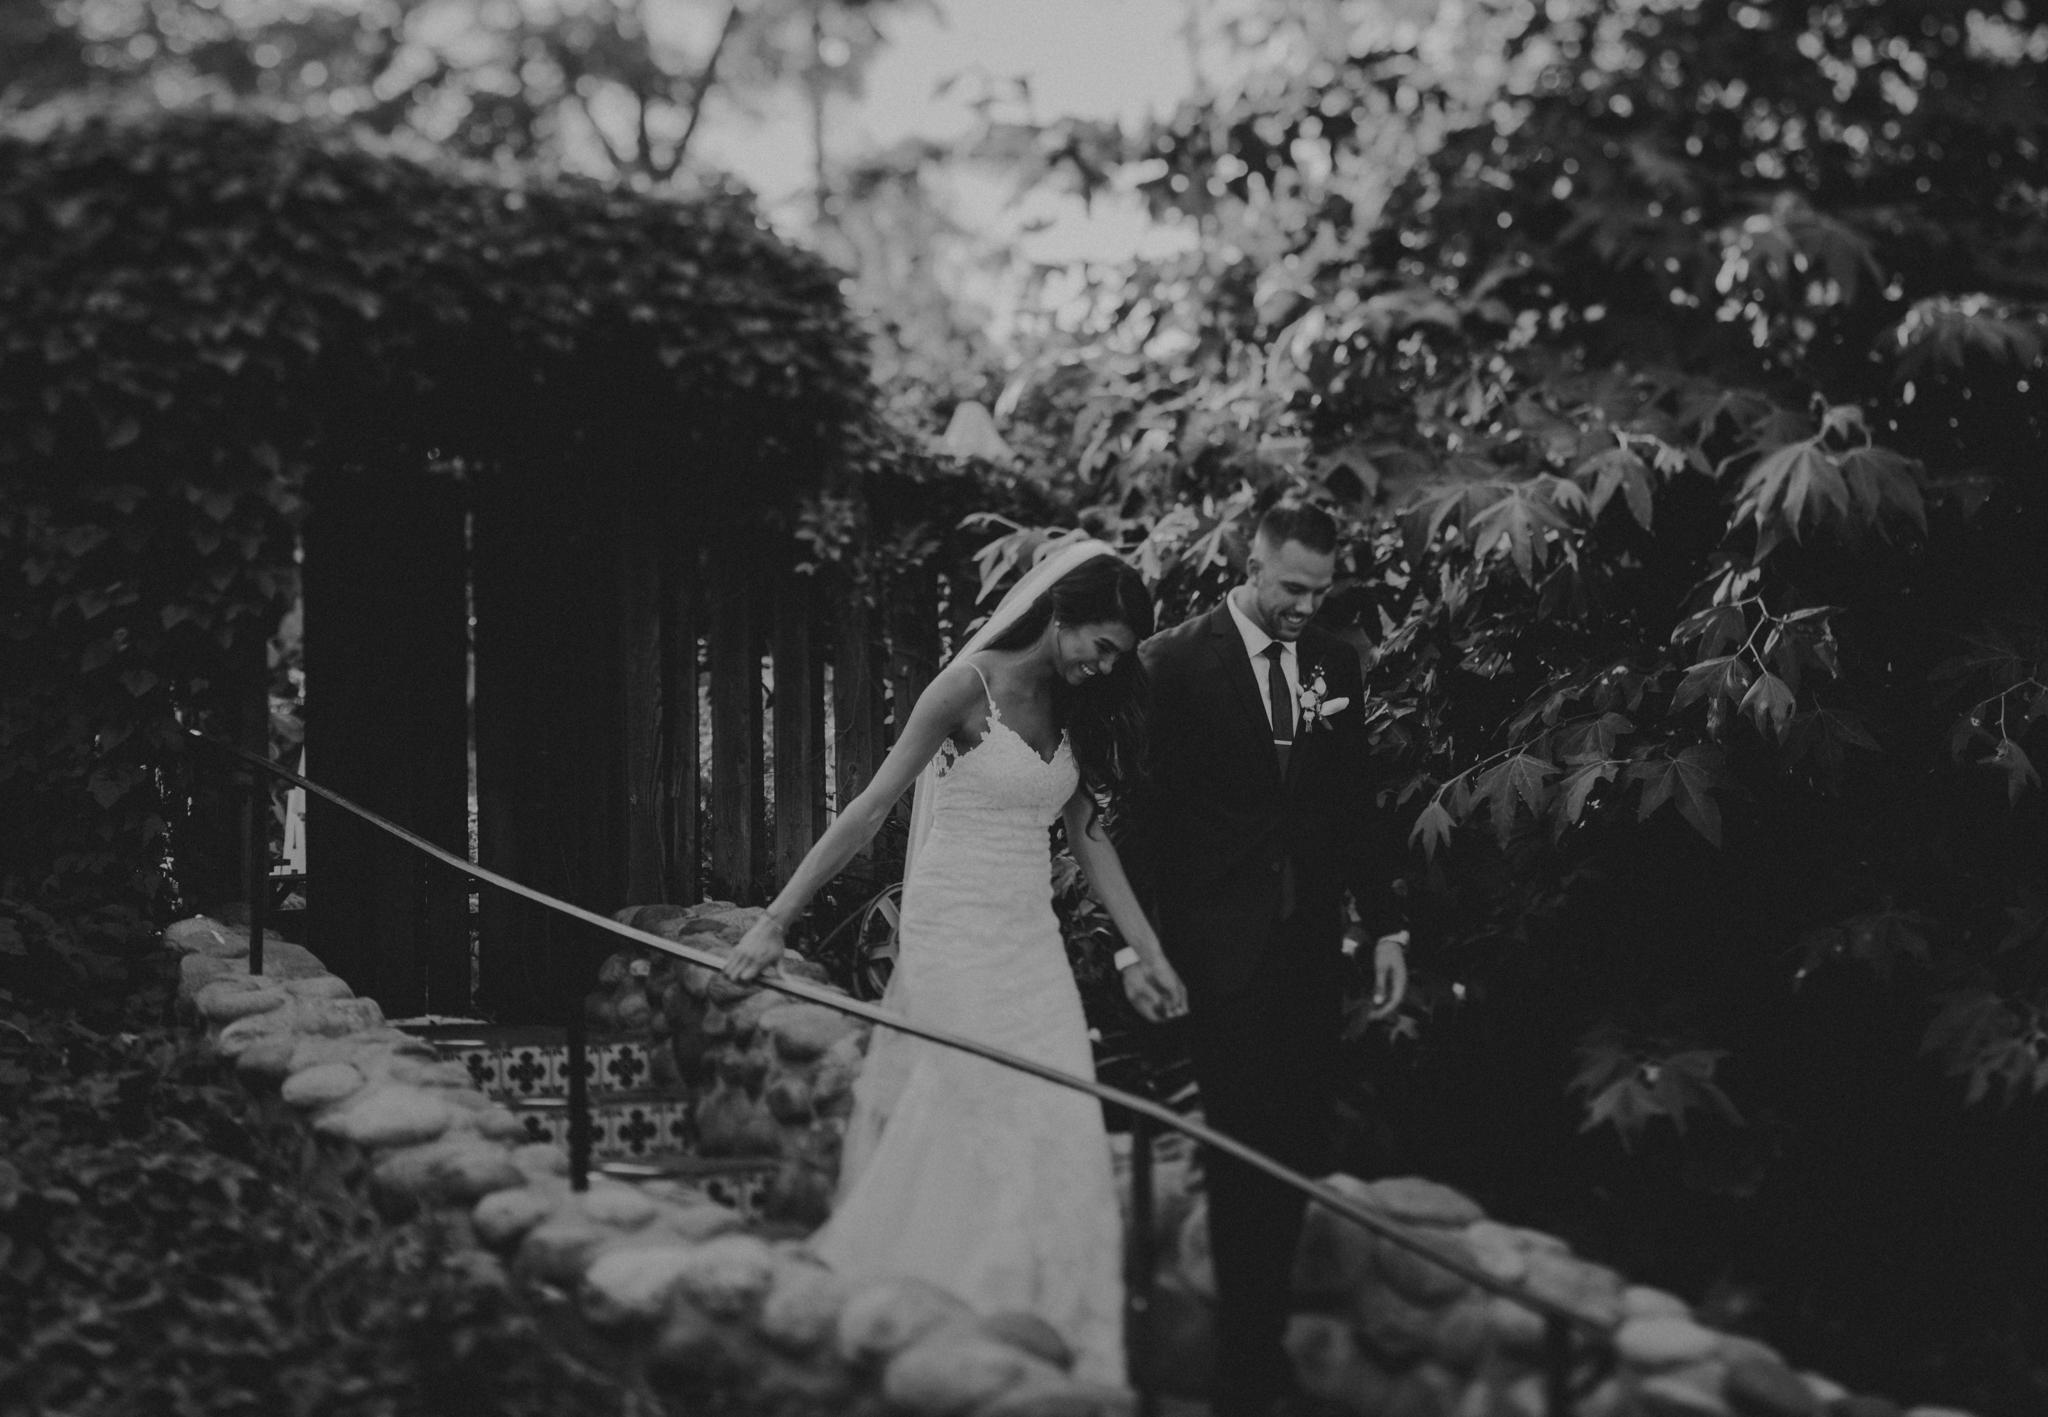 Isaiah + Taylor Photography - Rancho Las Lomas Wedding, Los Angeles Wedding Photographer-125.jpg